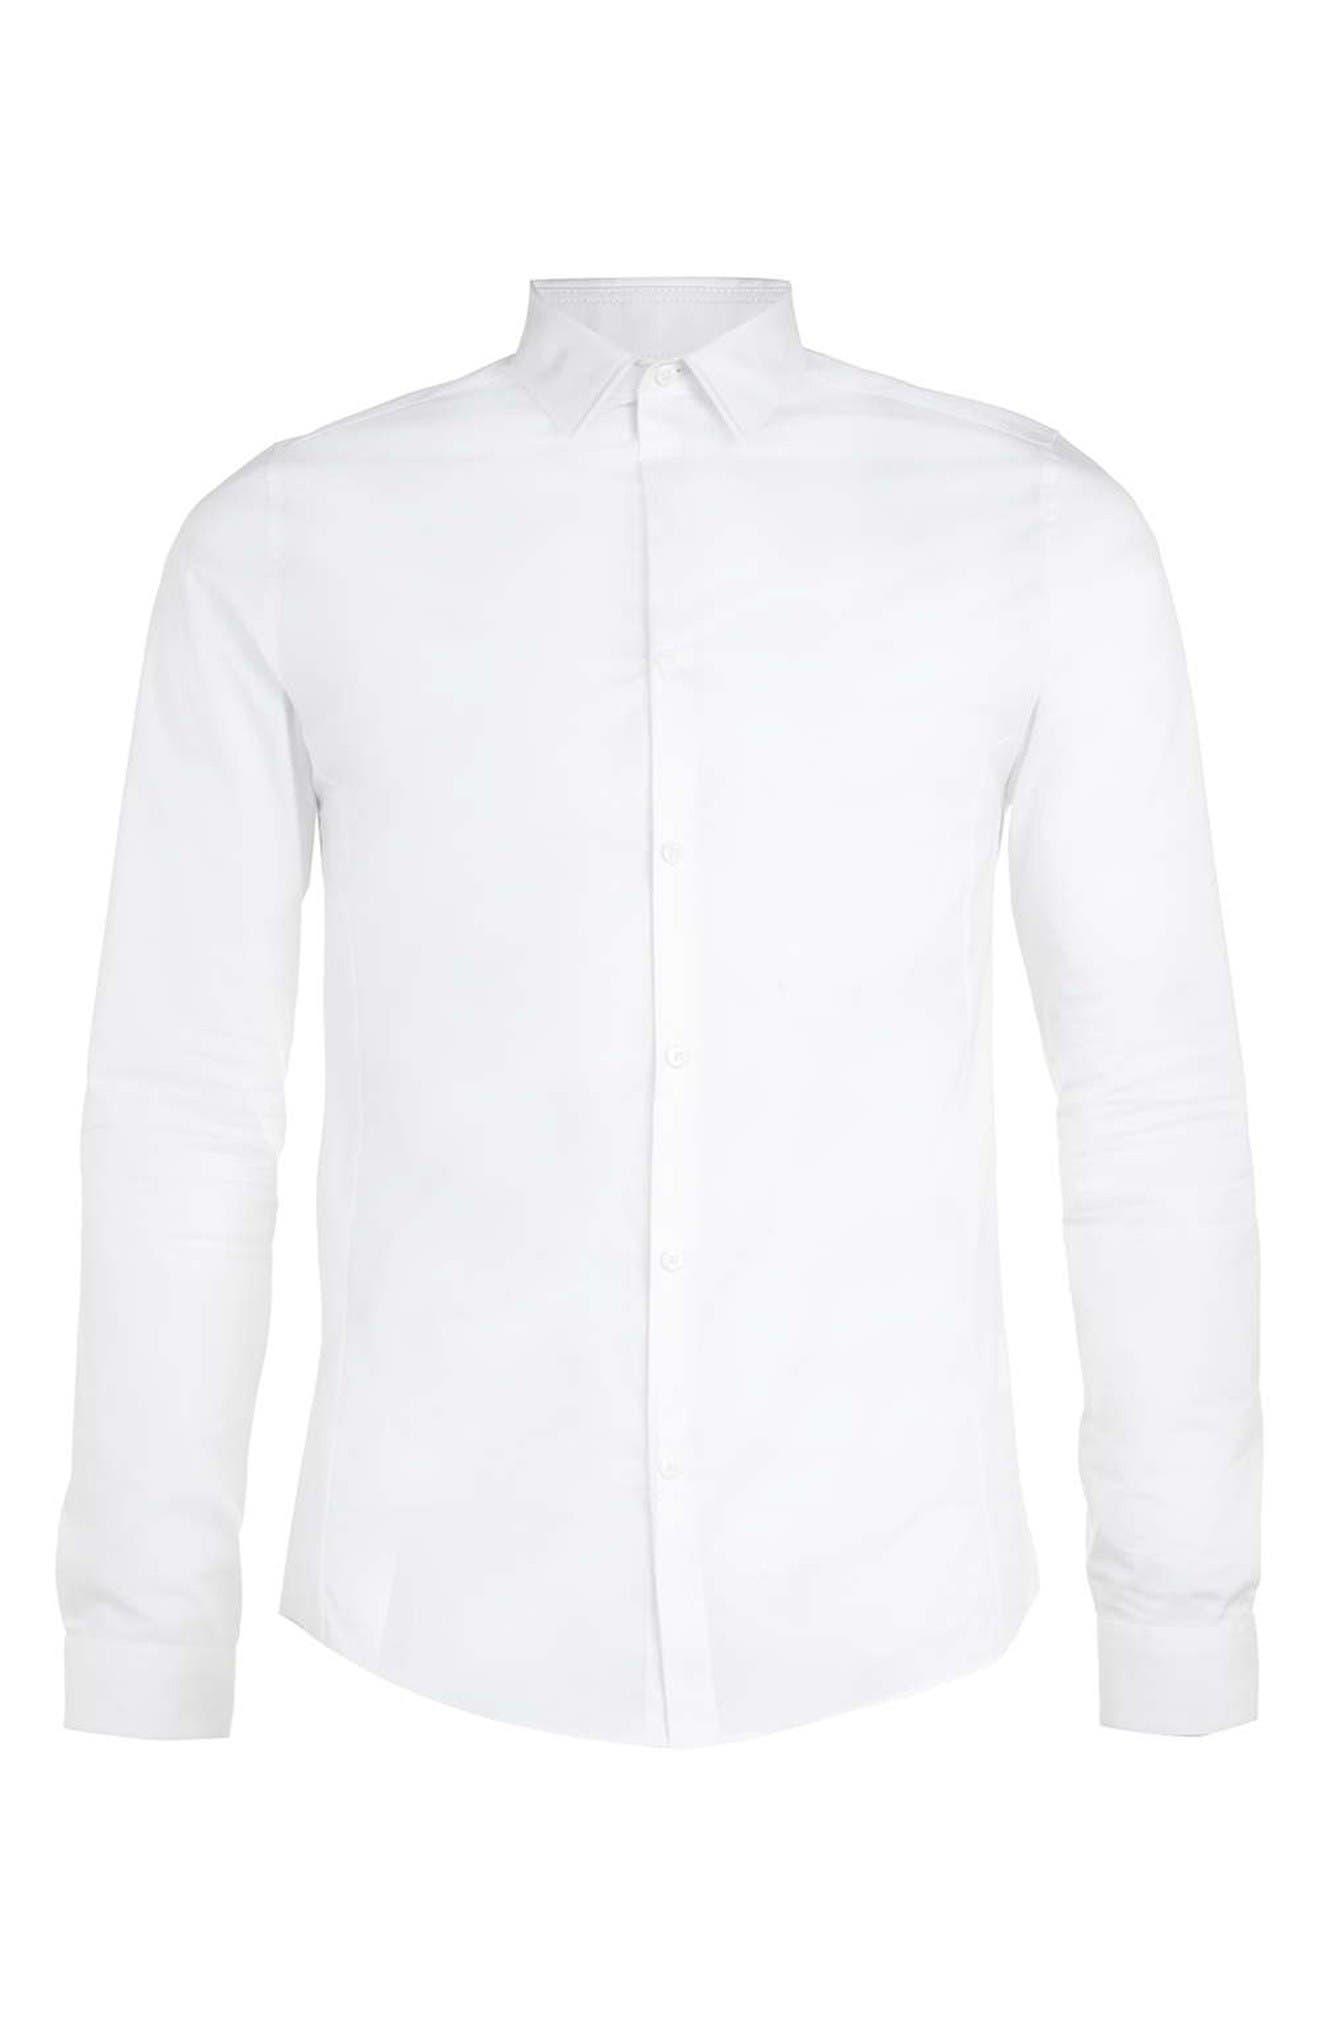 Long Sleeve Woven Shirt,                             Alternate thumbnail 6, color,                             White